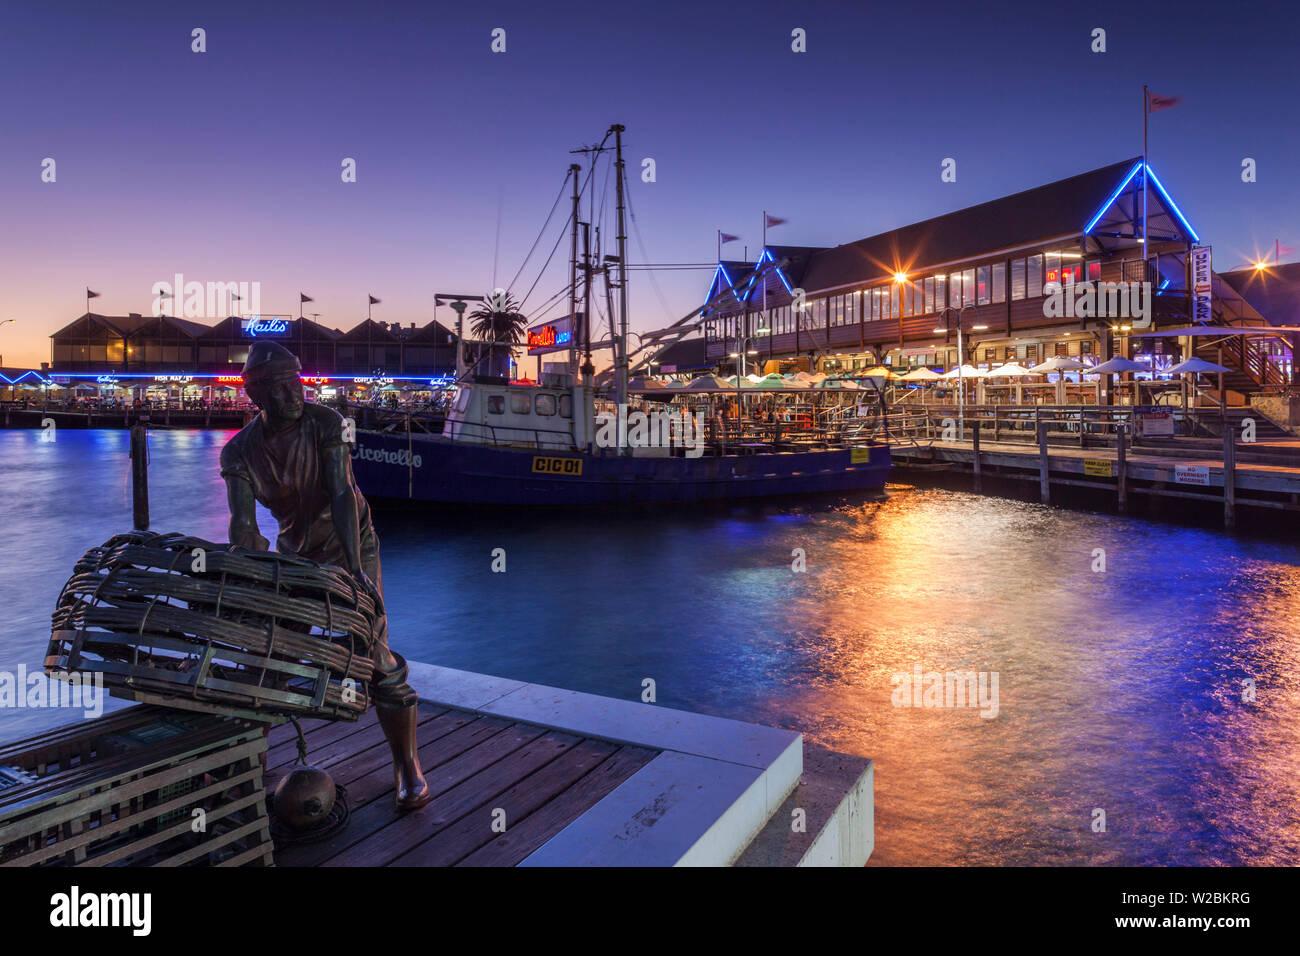 Australia, Western Australia, Freemantle, Fishing Boat Harbour, eveing with Fishermen's Memorial sculpture by Greg James and Jon Tarry - Stock Image